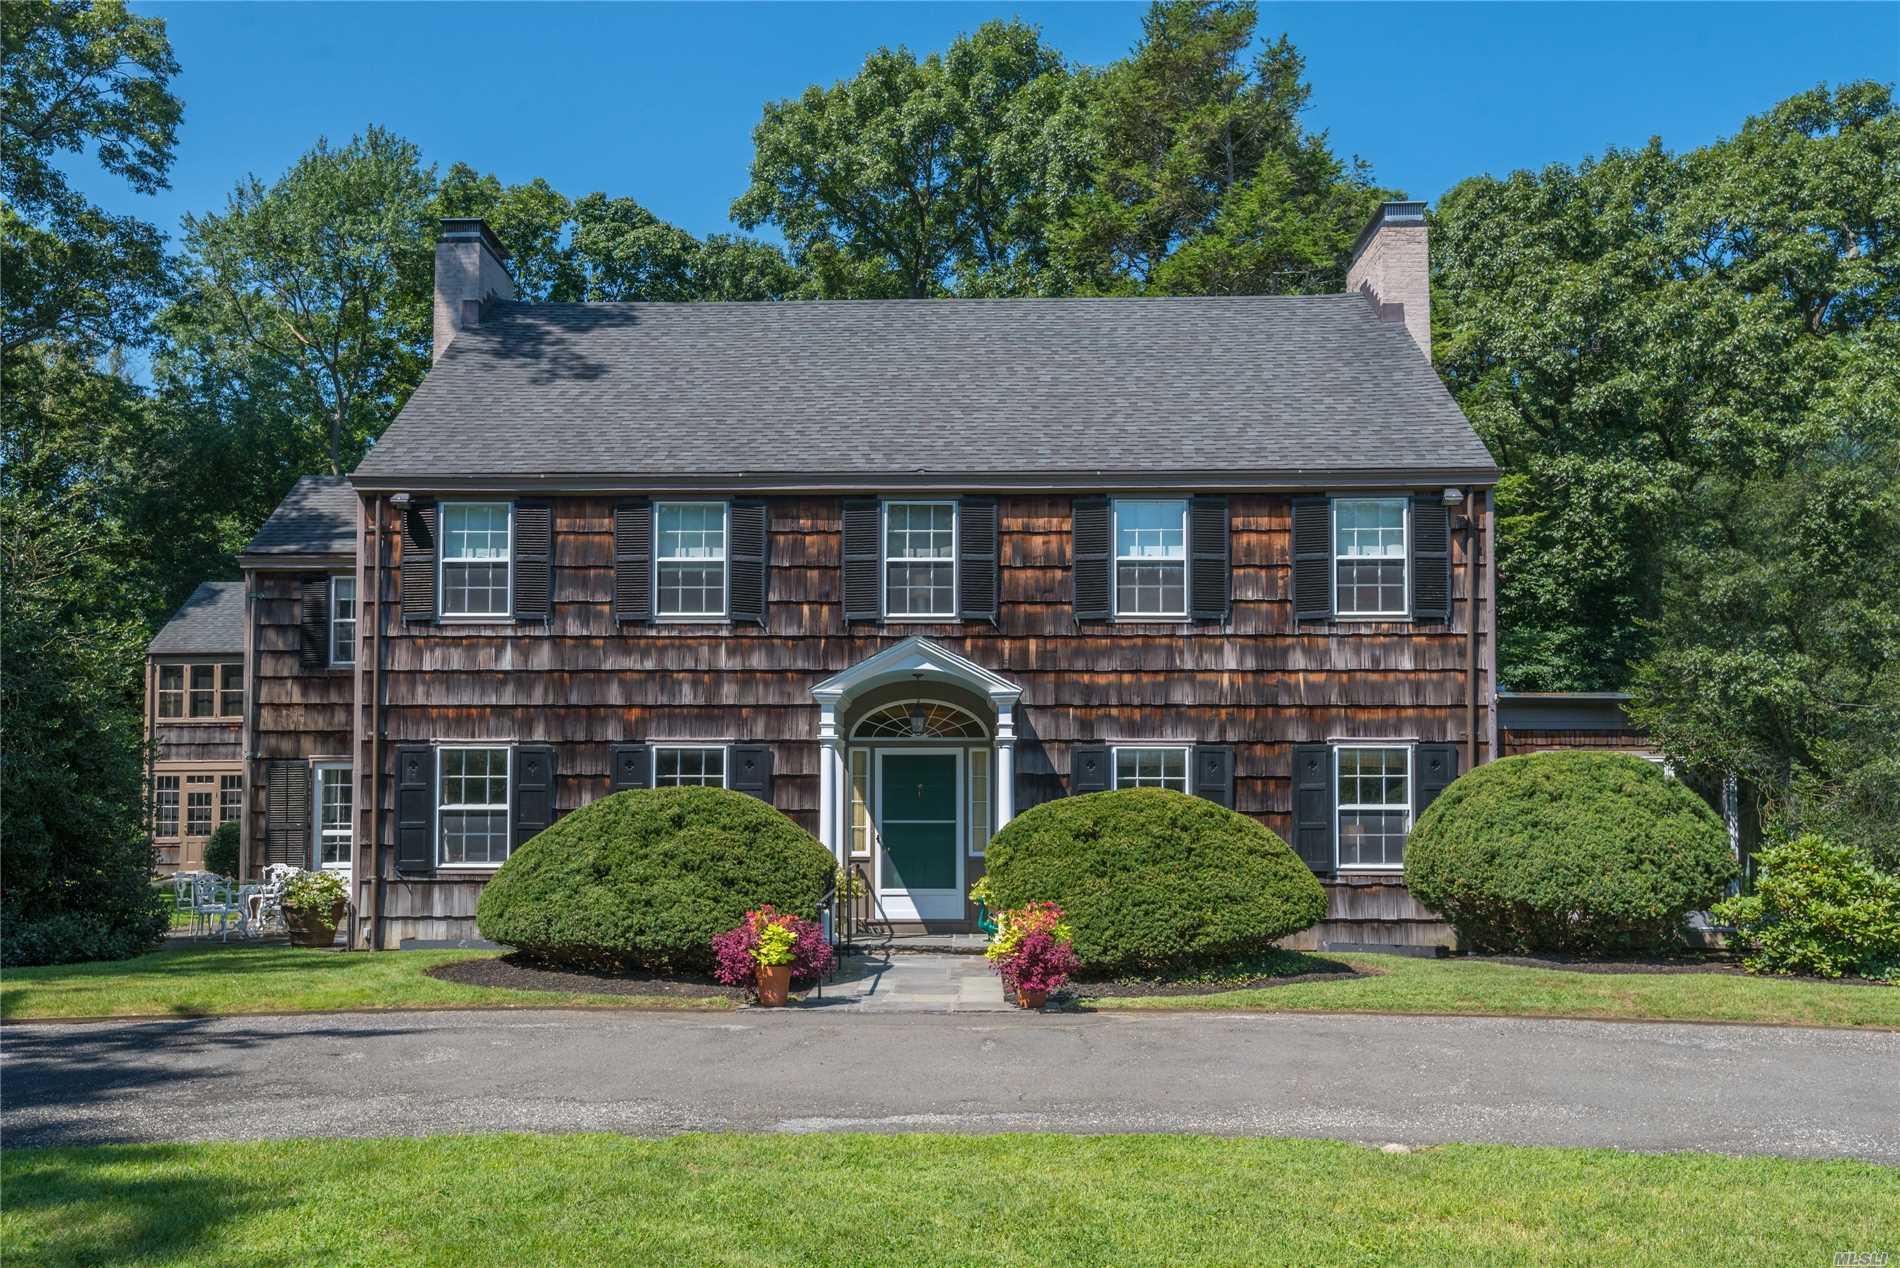 Photo of home for sale at 9 Pomeroy Ln, Lattingtown NY